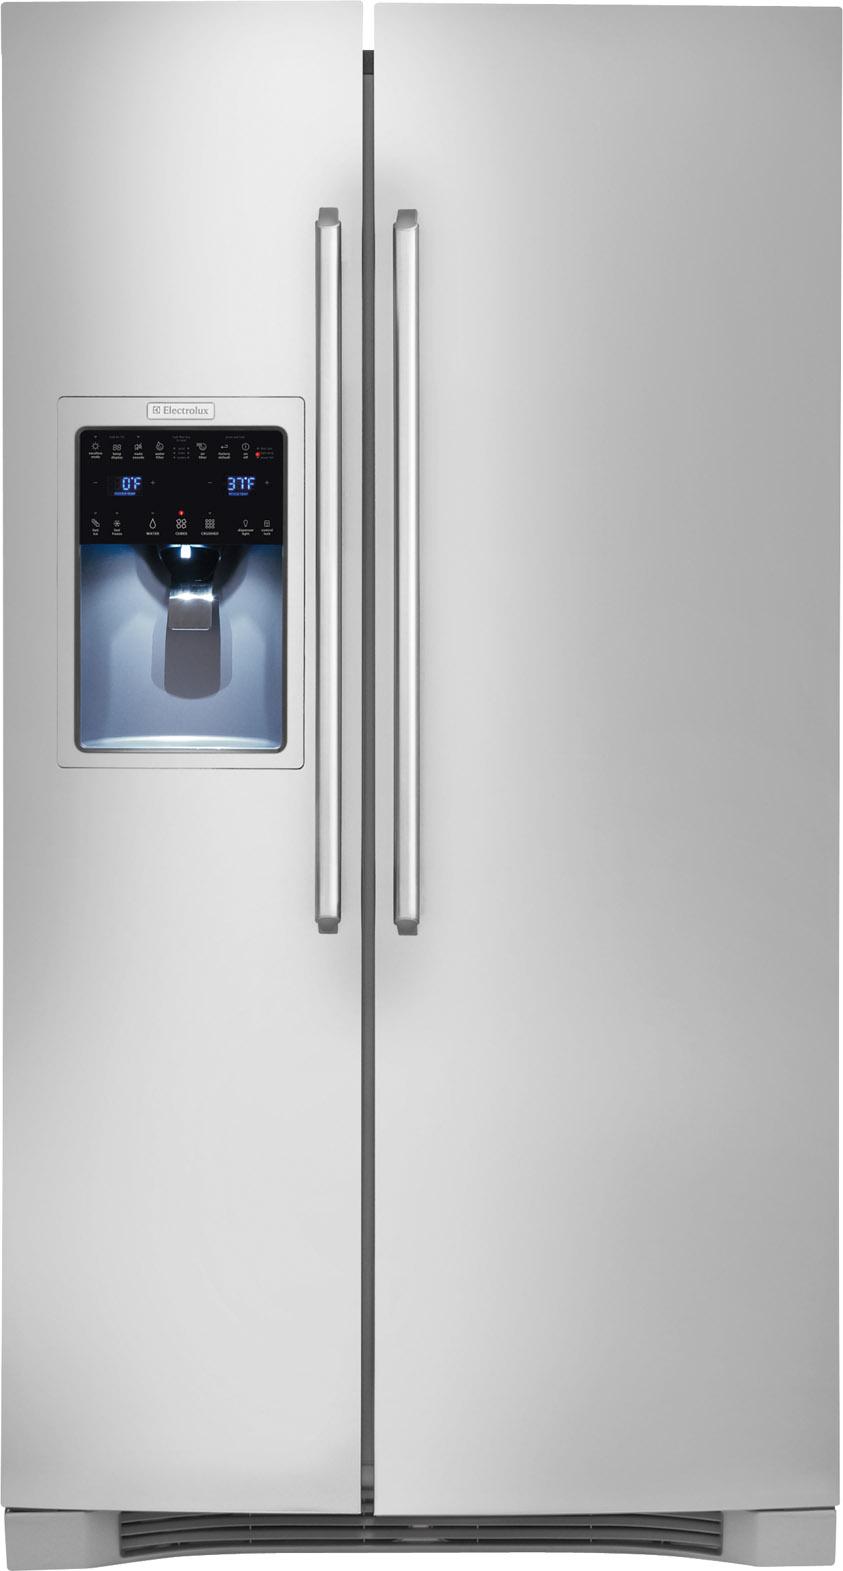 Electrolux Refrigerator Model EI26SS30JS1 Parts